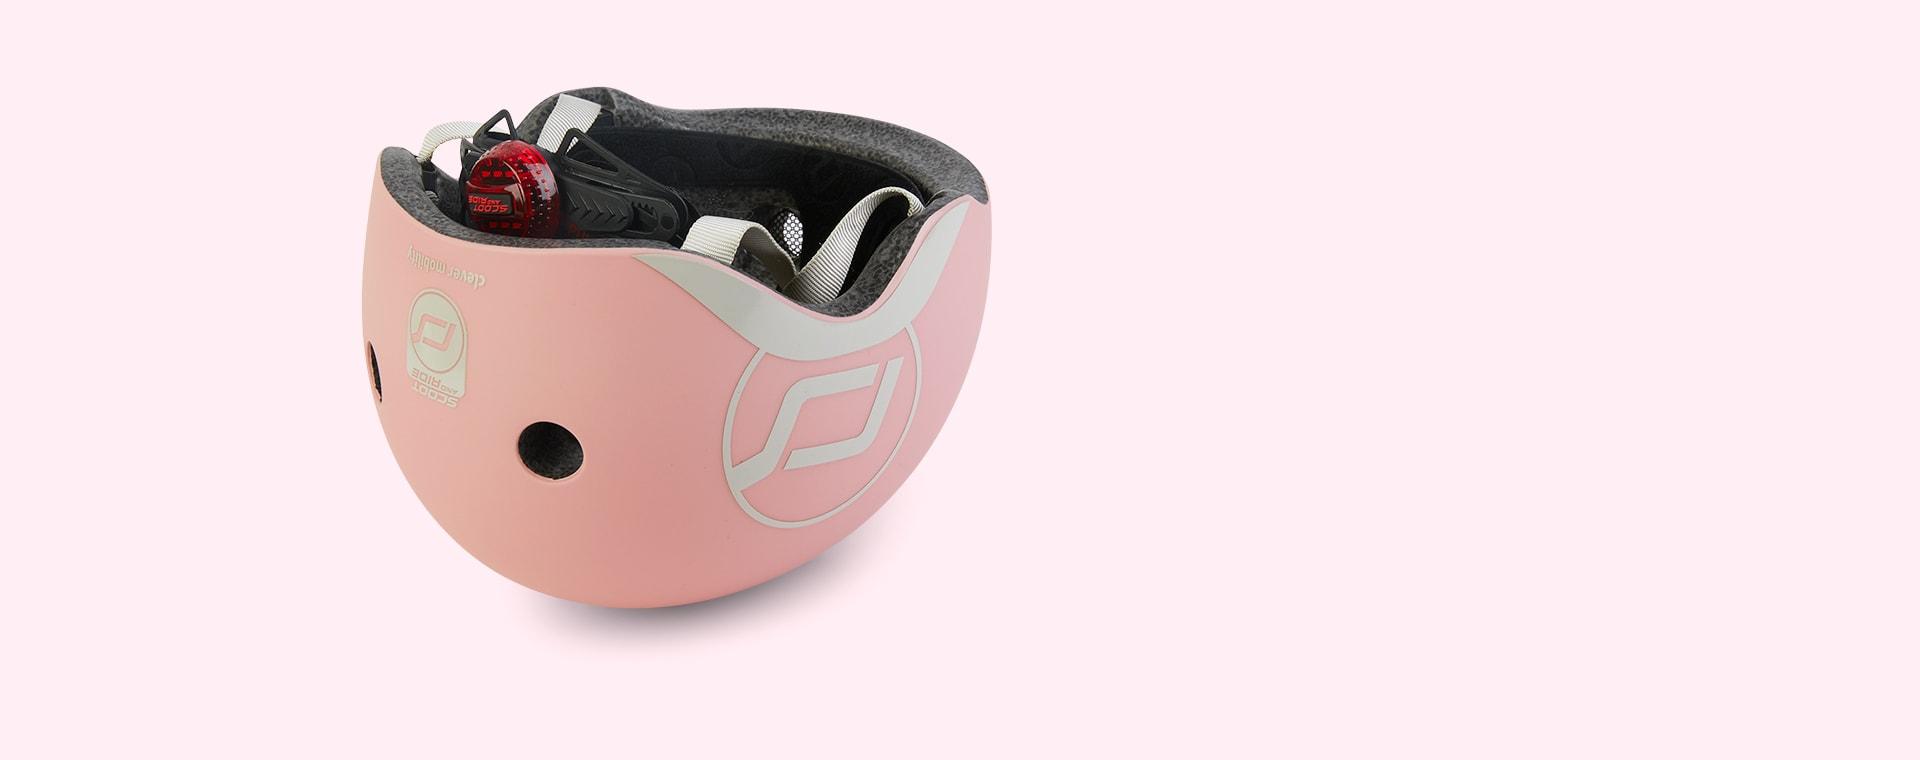 Rose Scoot & Ride Helmet